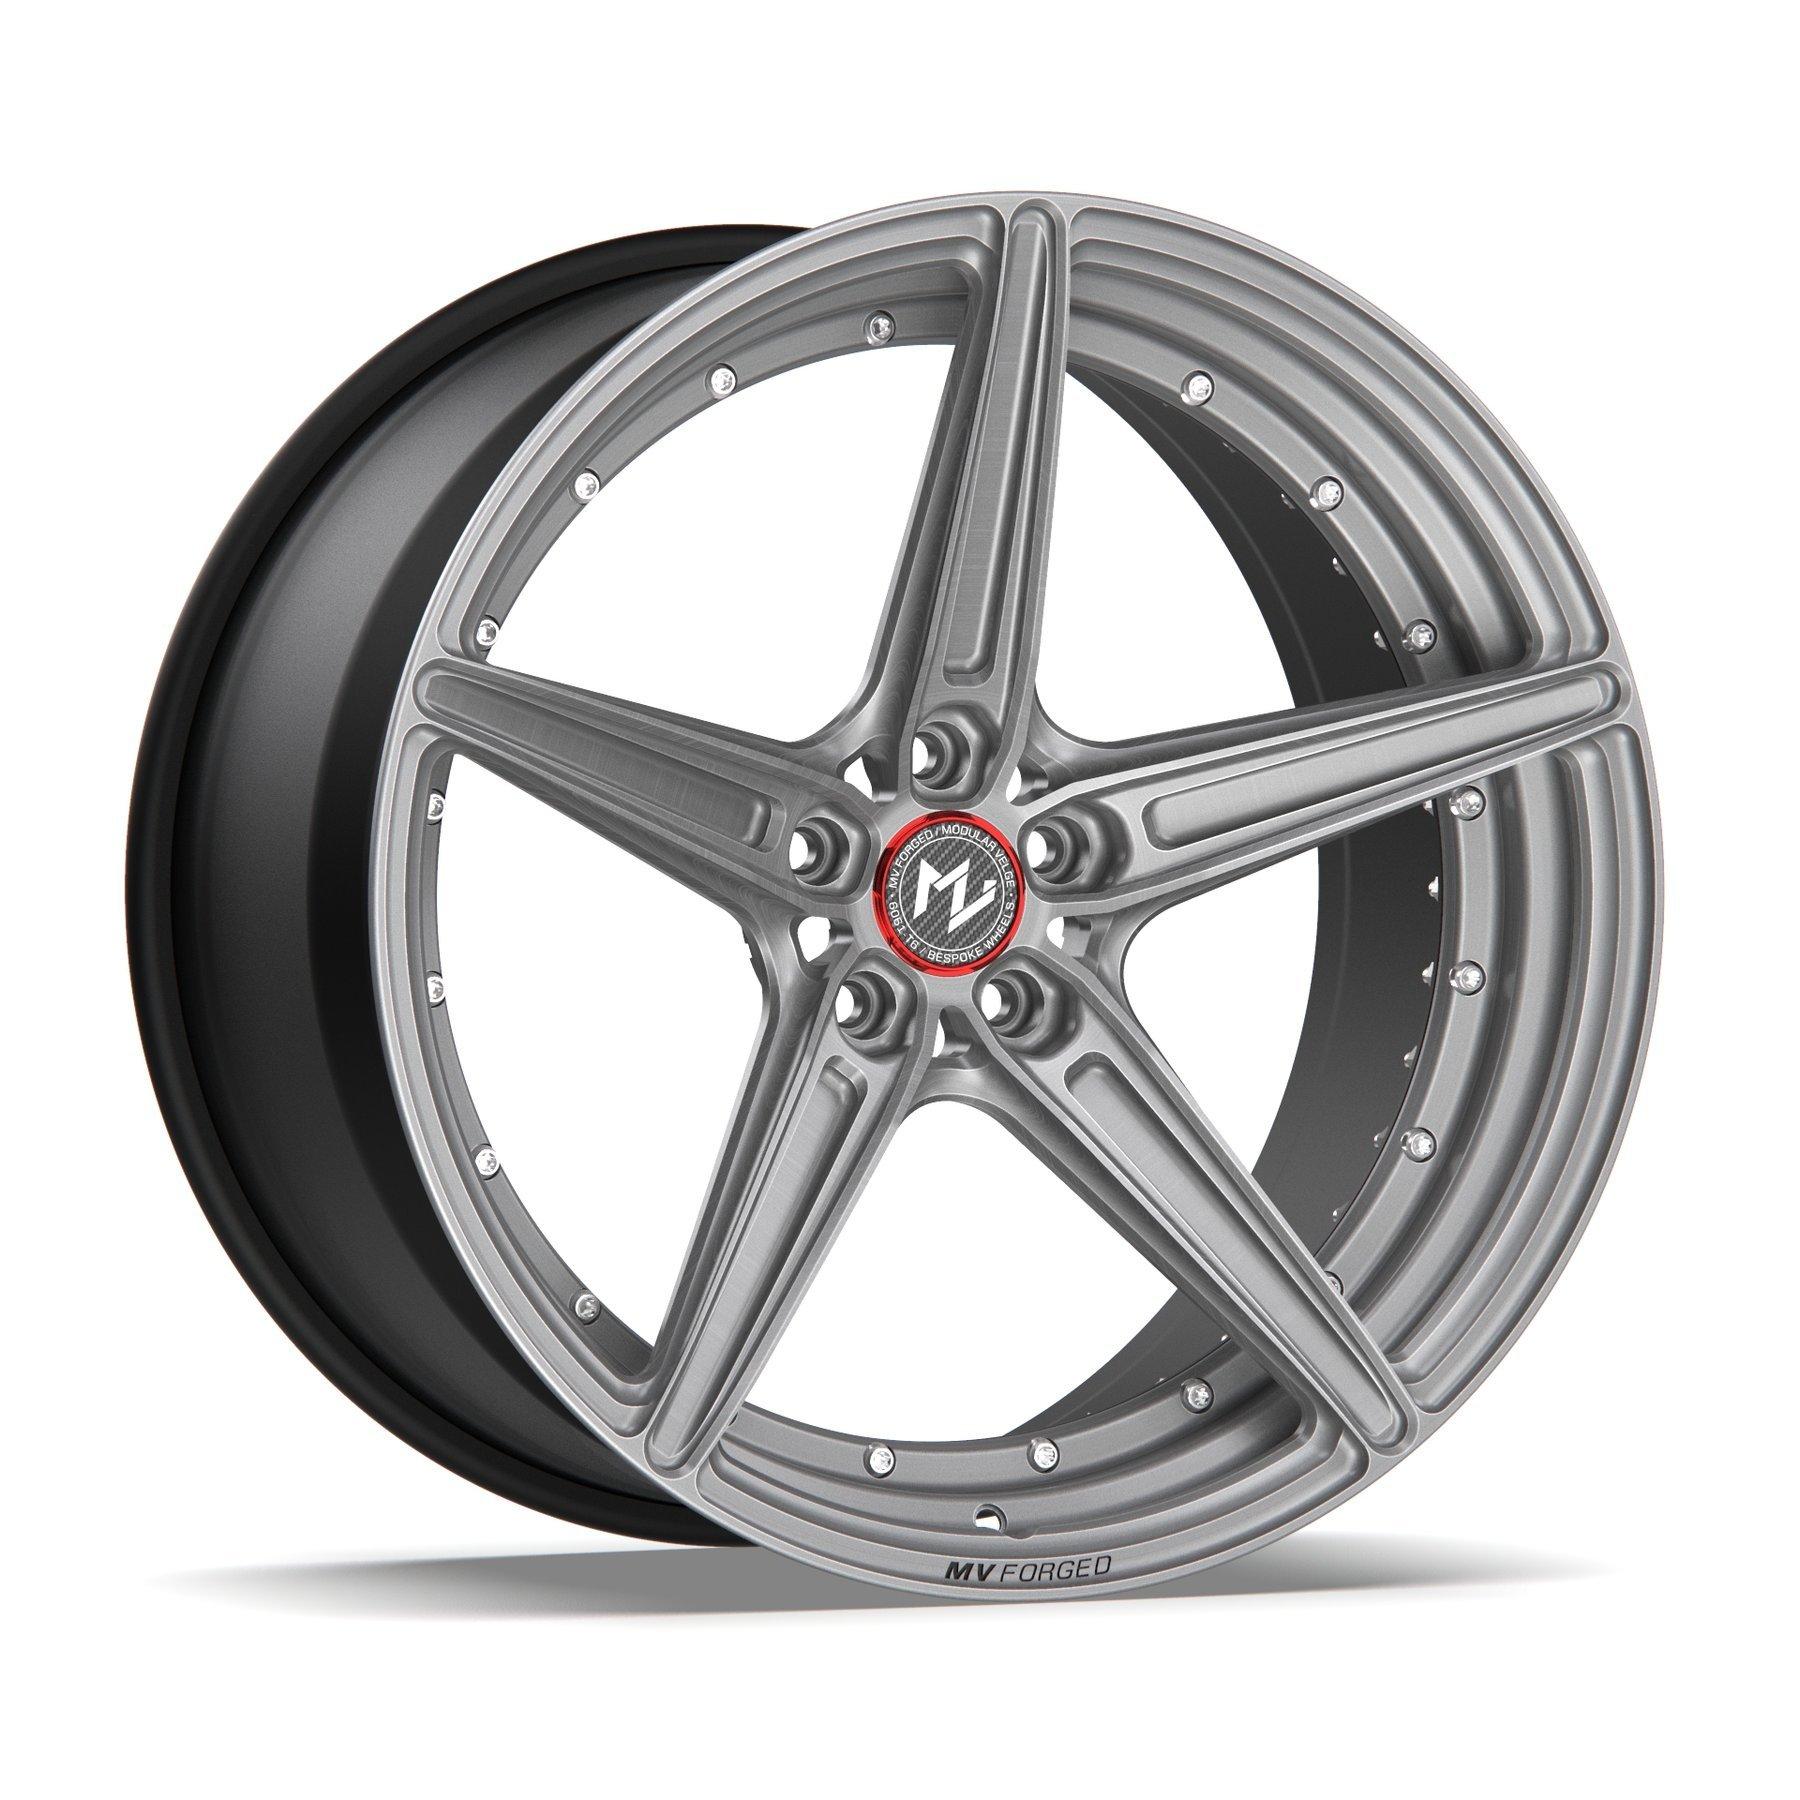 Modular Velge MR-505 DUO forged wheels